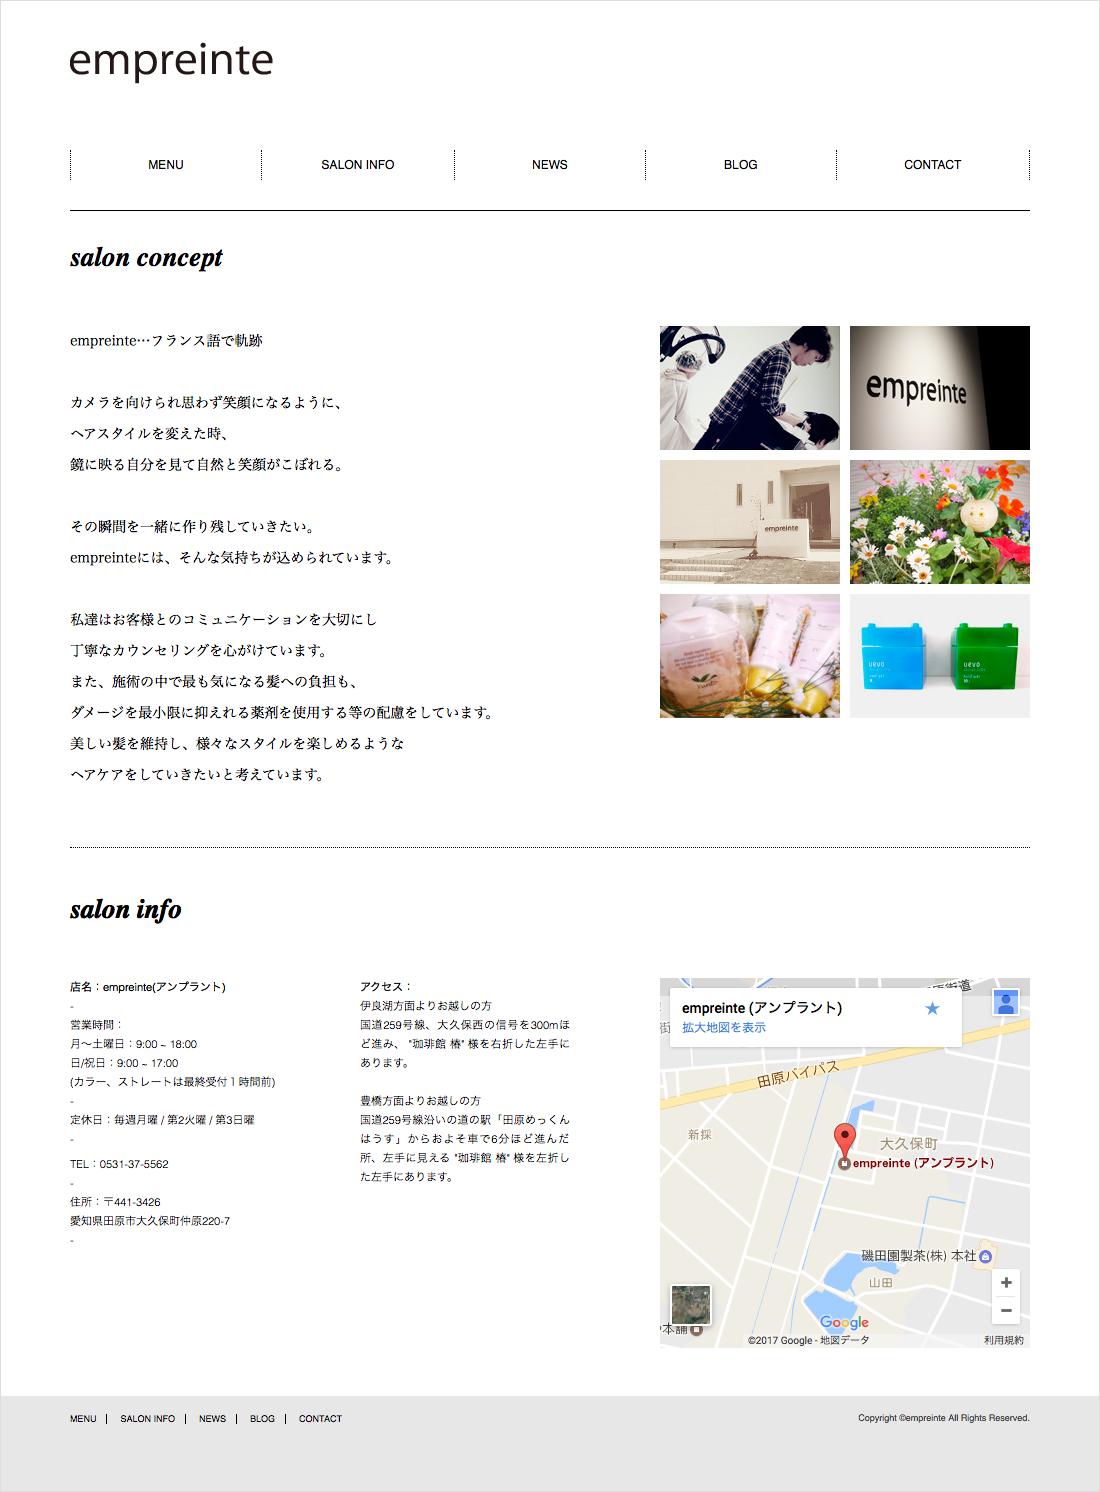 empreinte ホームページデザイン 3